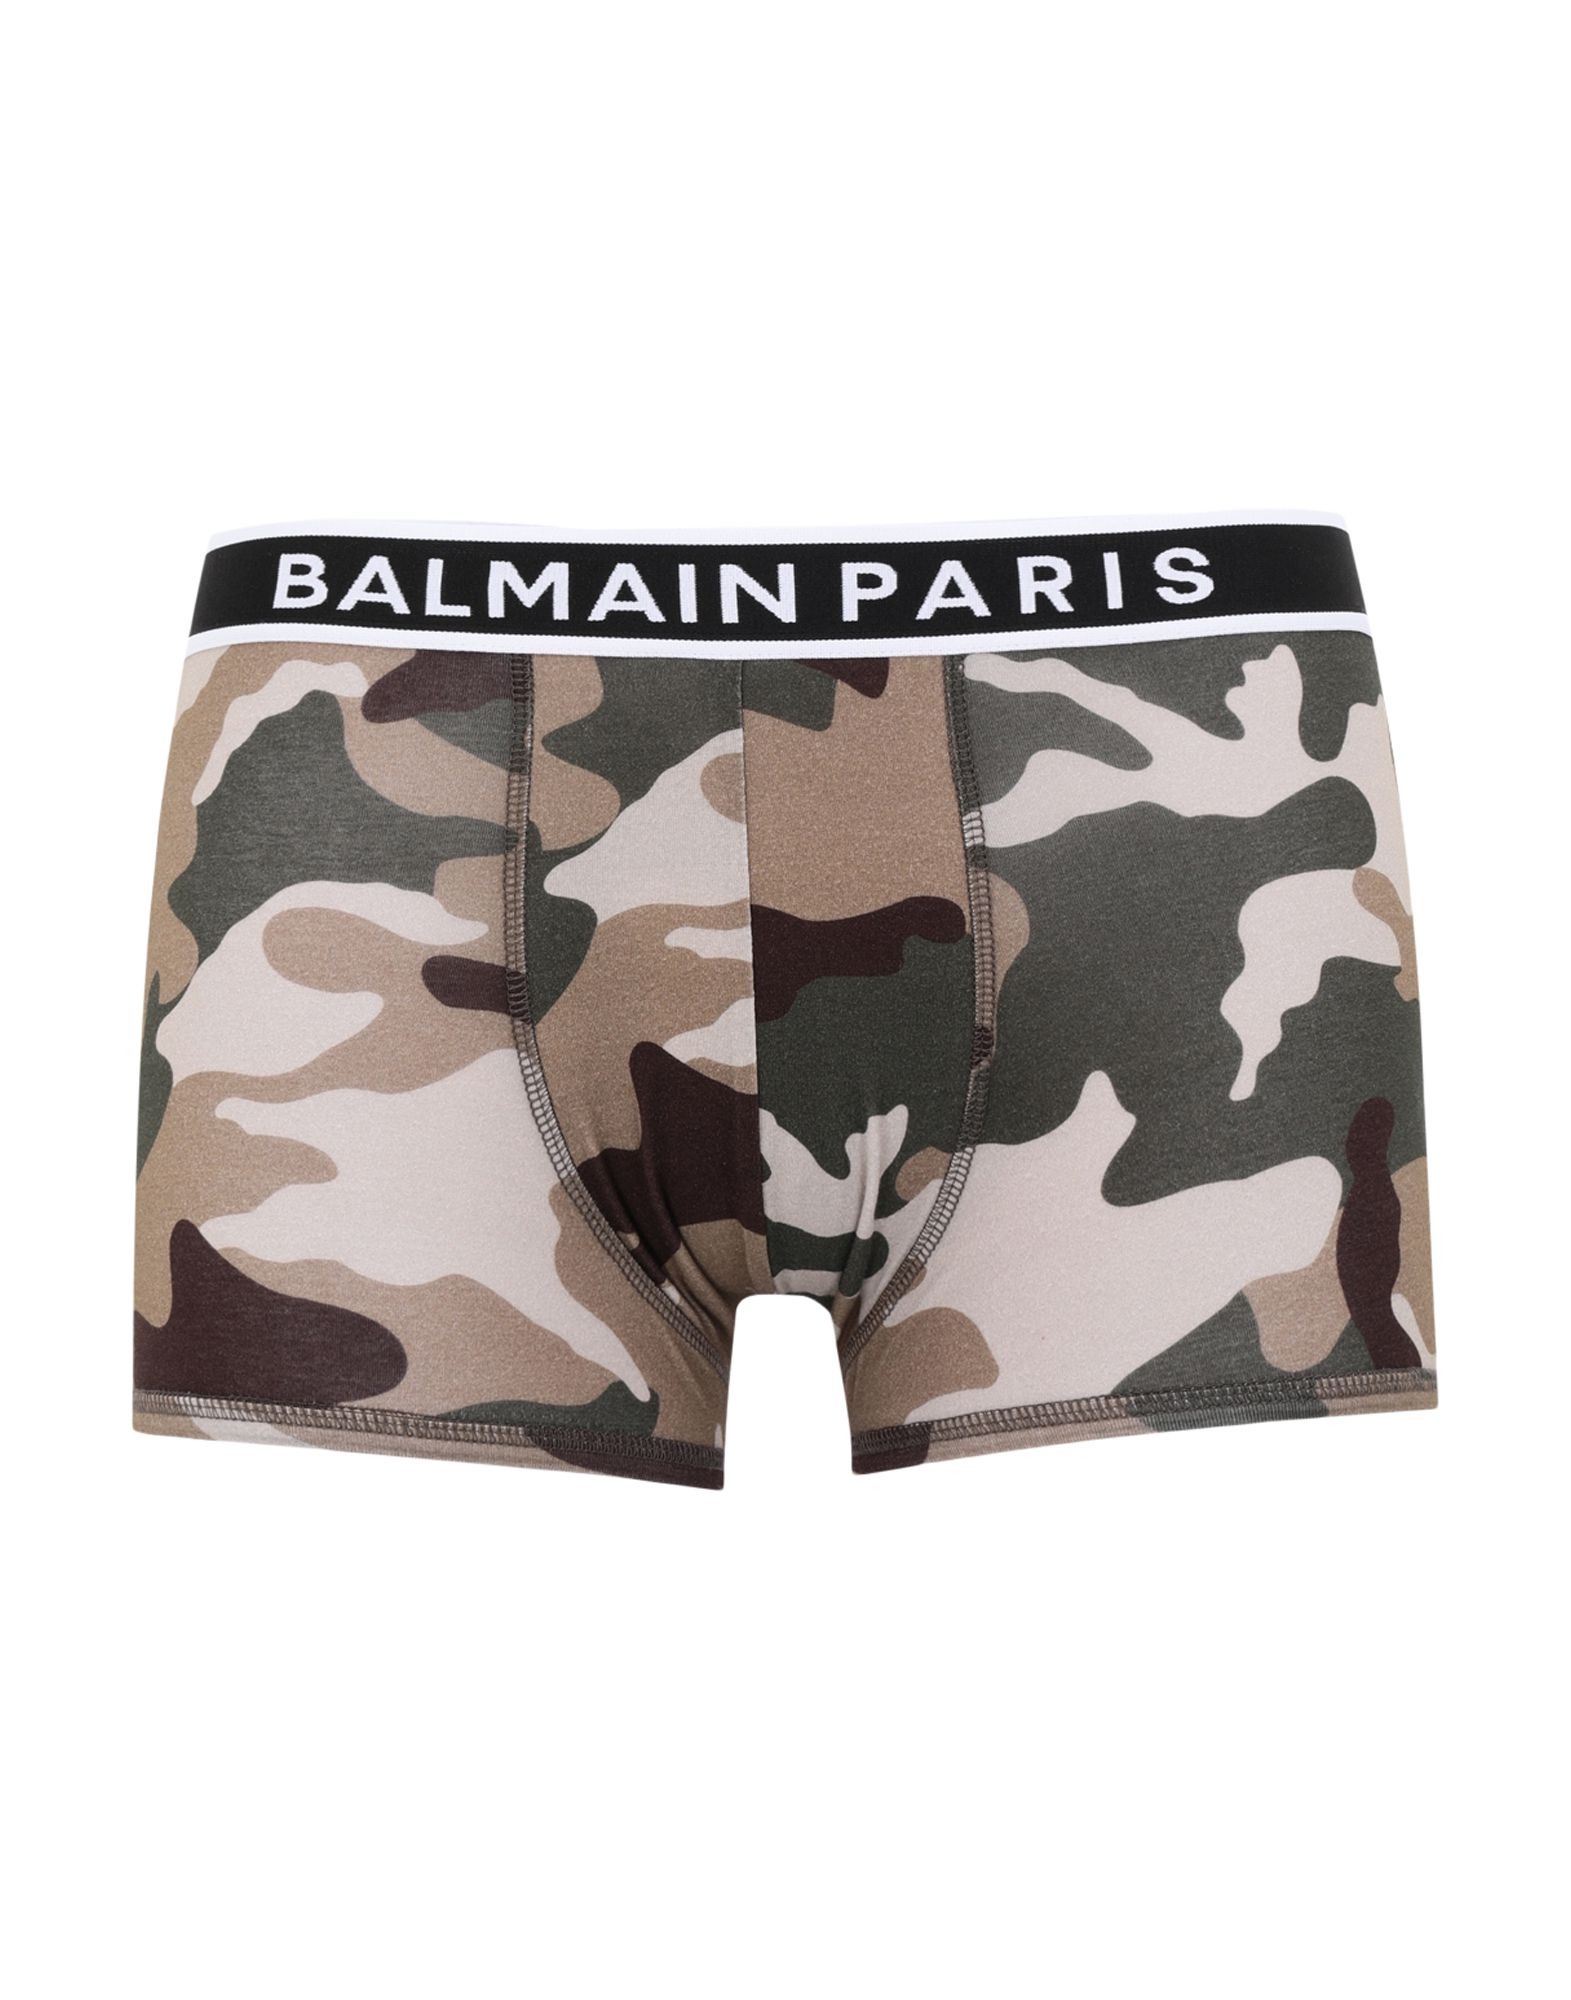 BALMAIN Boxers. jersey, logo, camouflage, elasticized waist, stretch. 90% Cotton, 10% Elastane